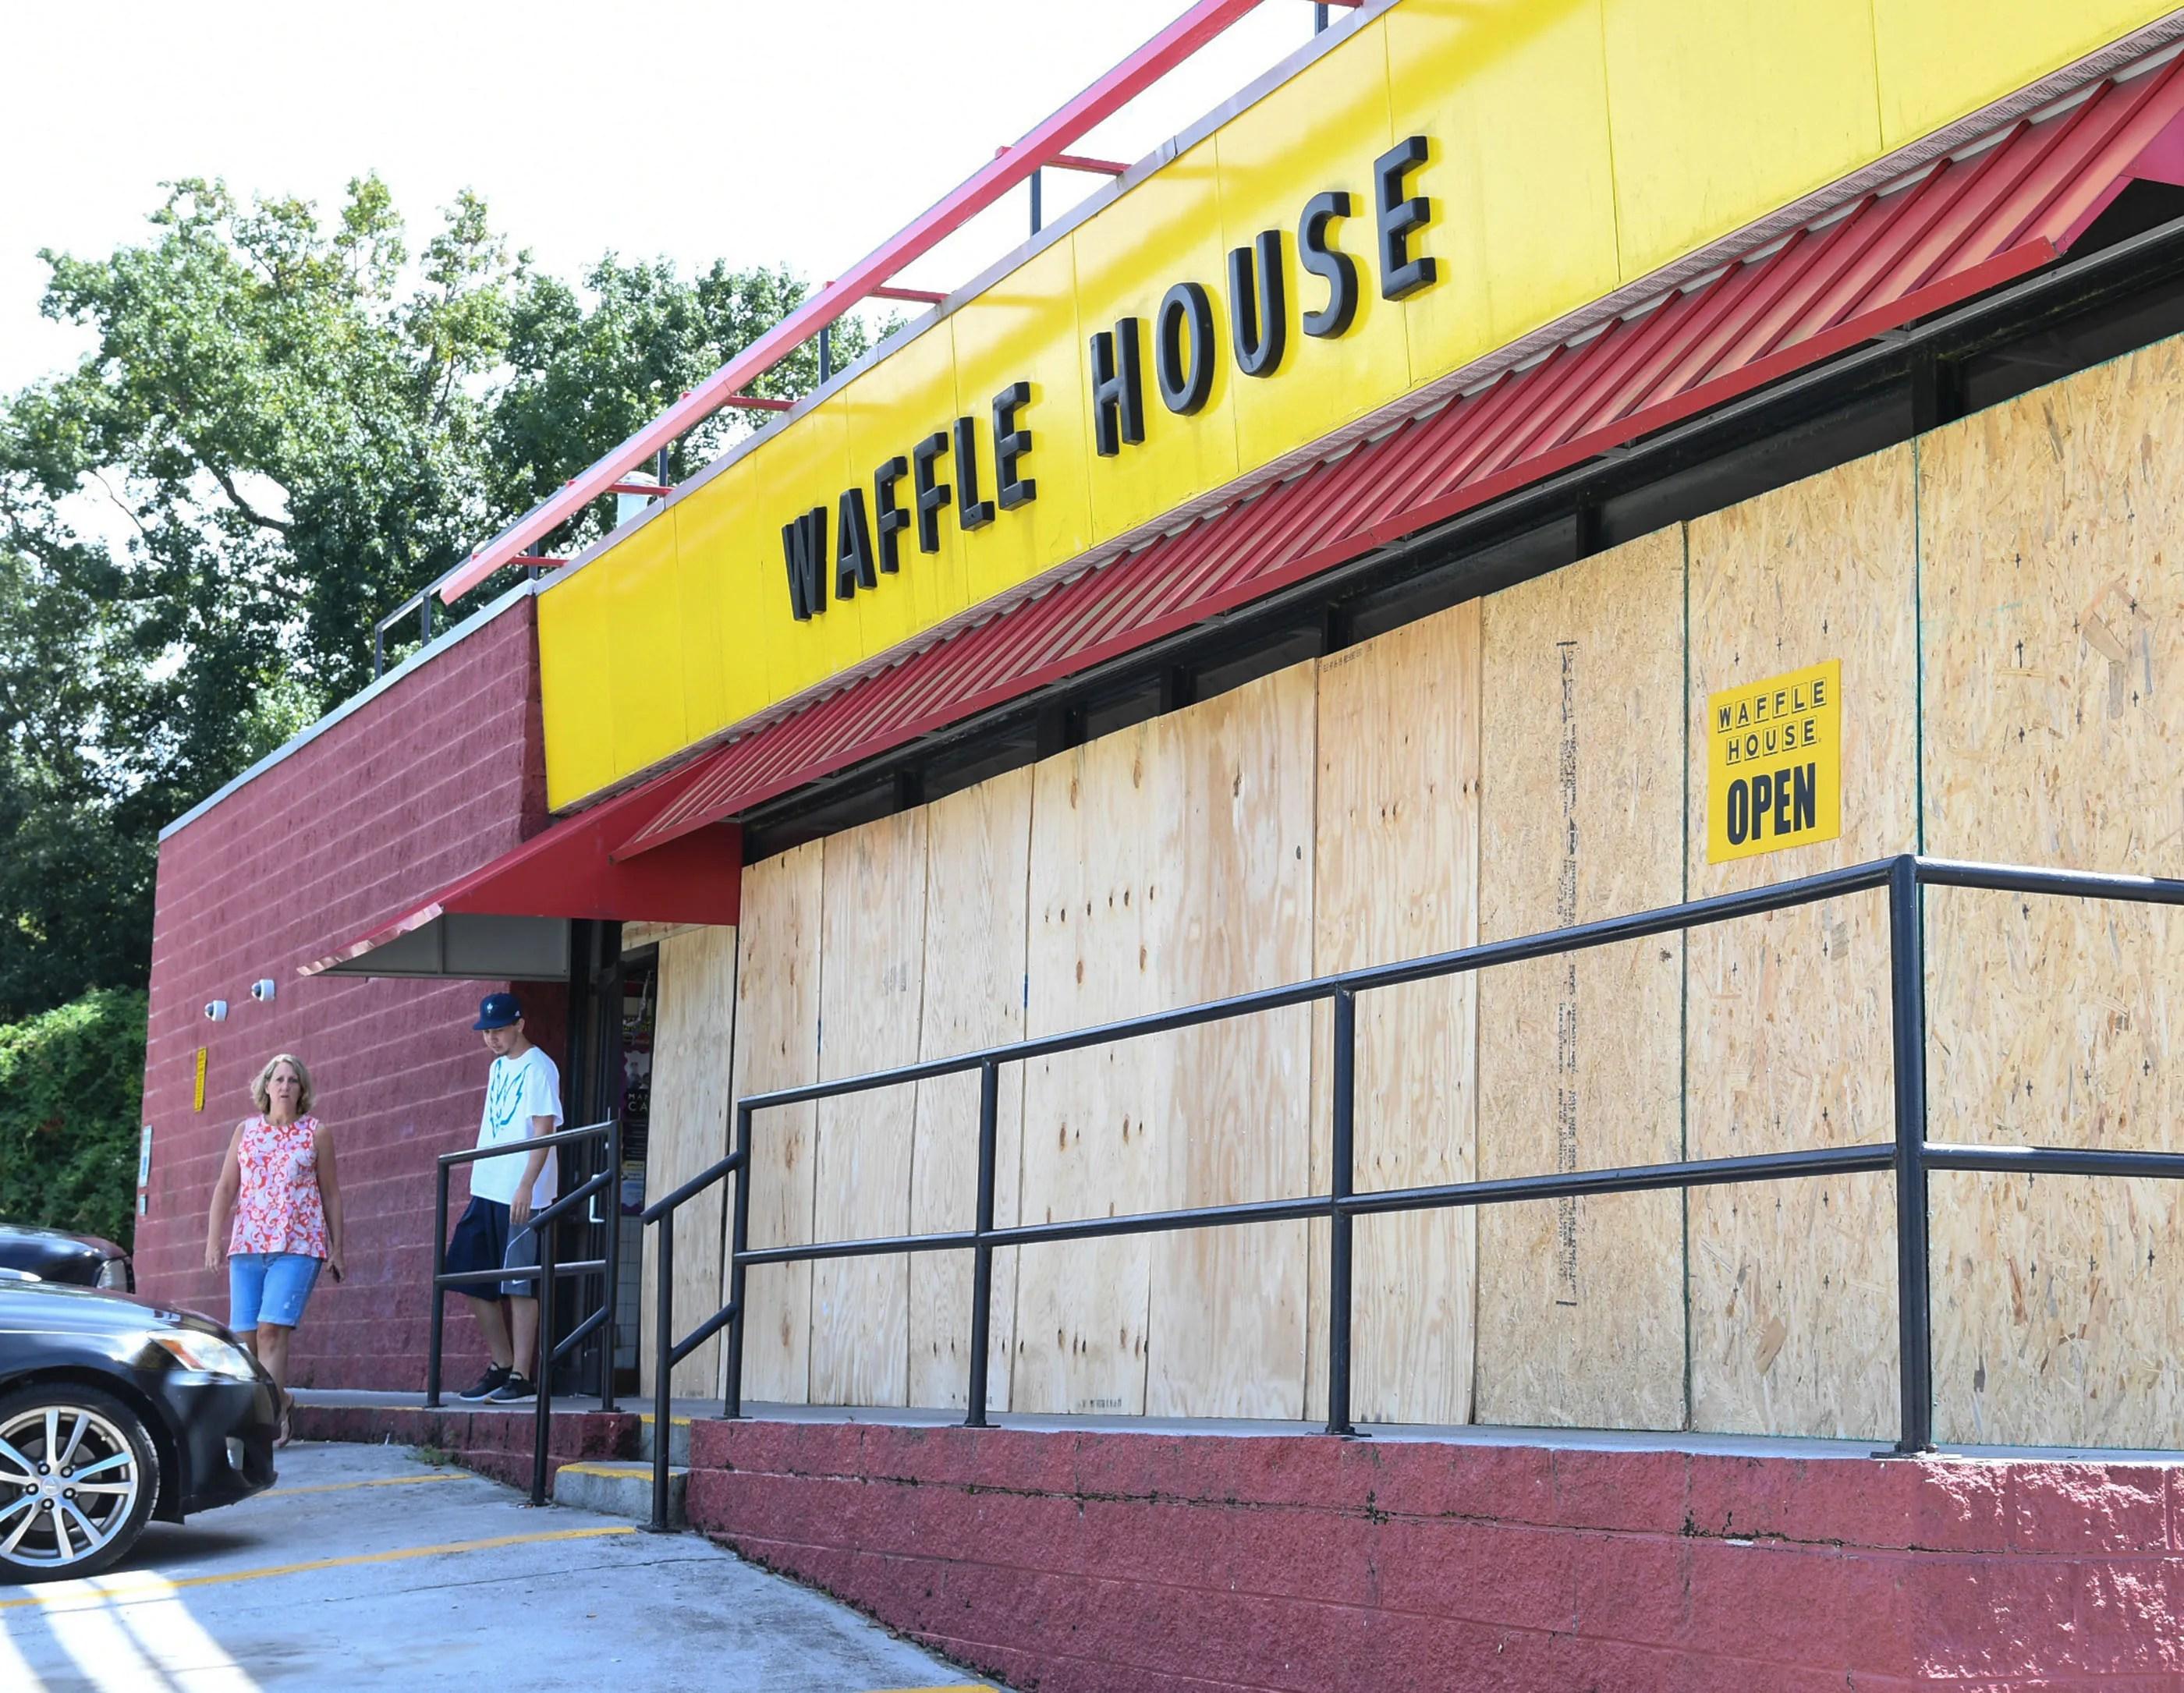 Waffle House Panama City Beach Florida